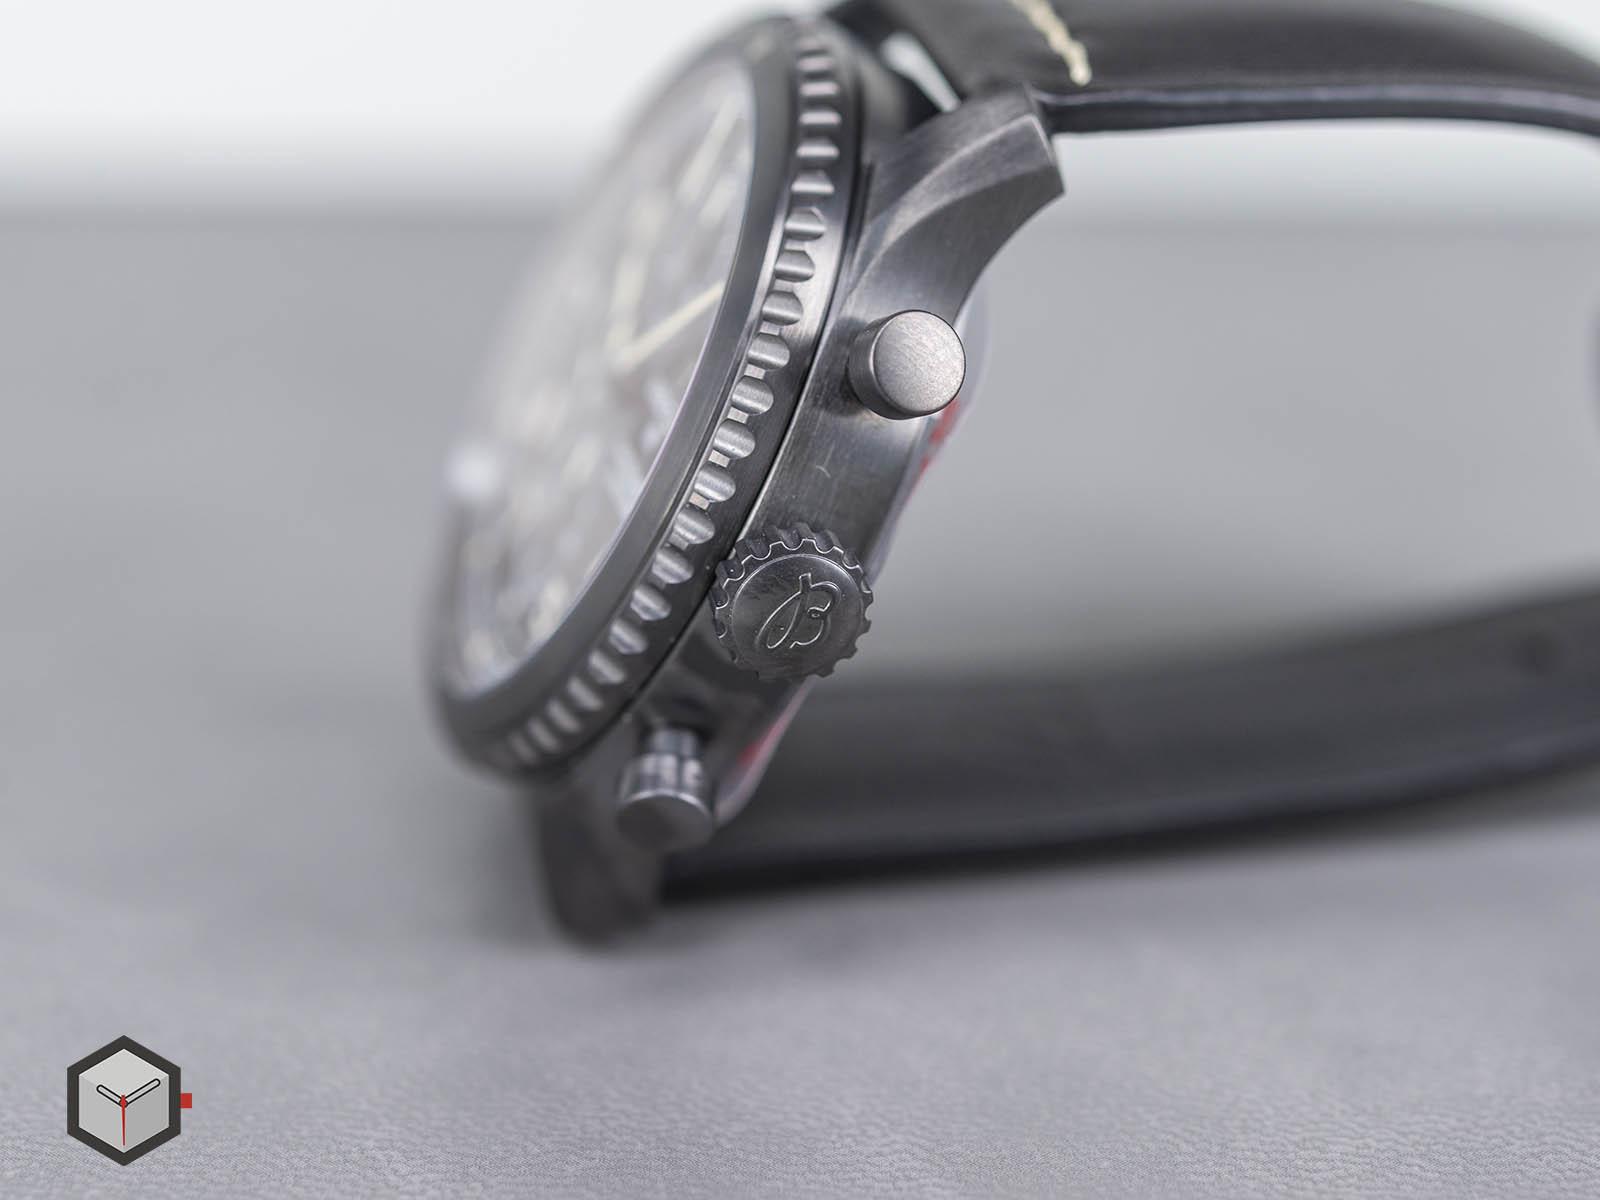 m13314101b1x1-breitling-navitimer-8-chronograph-43-blacksteel-5.jpg